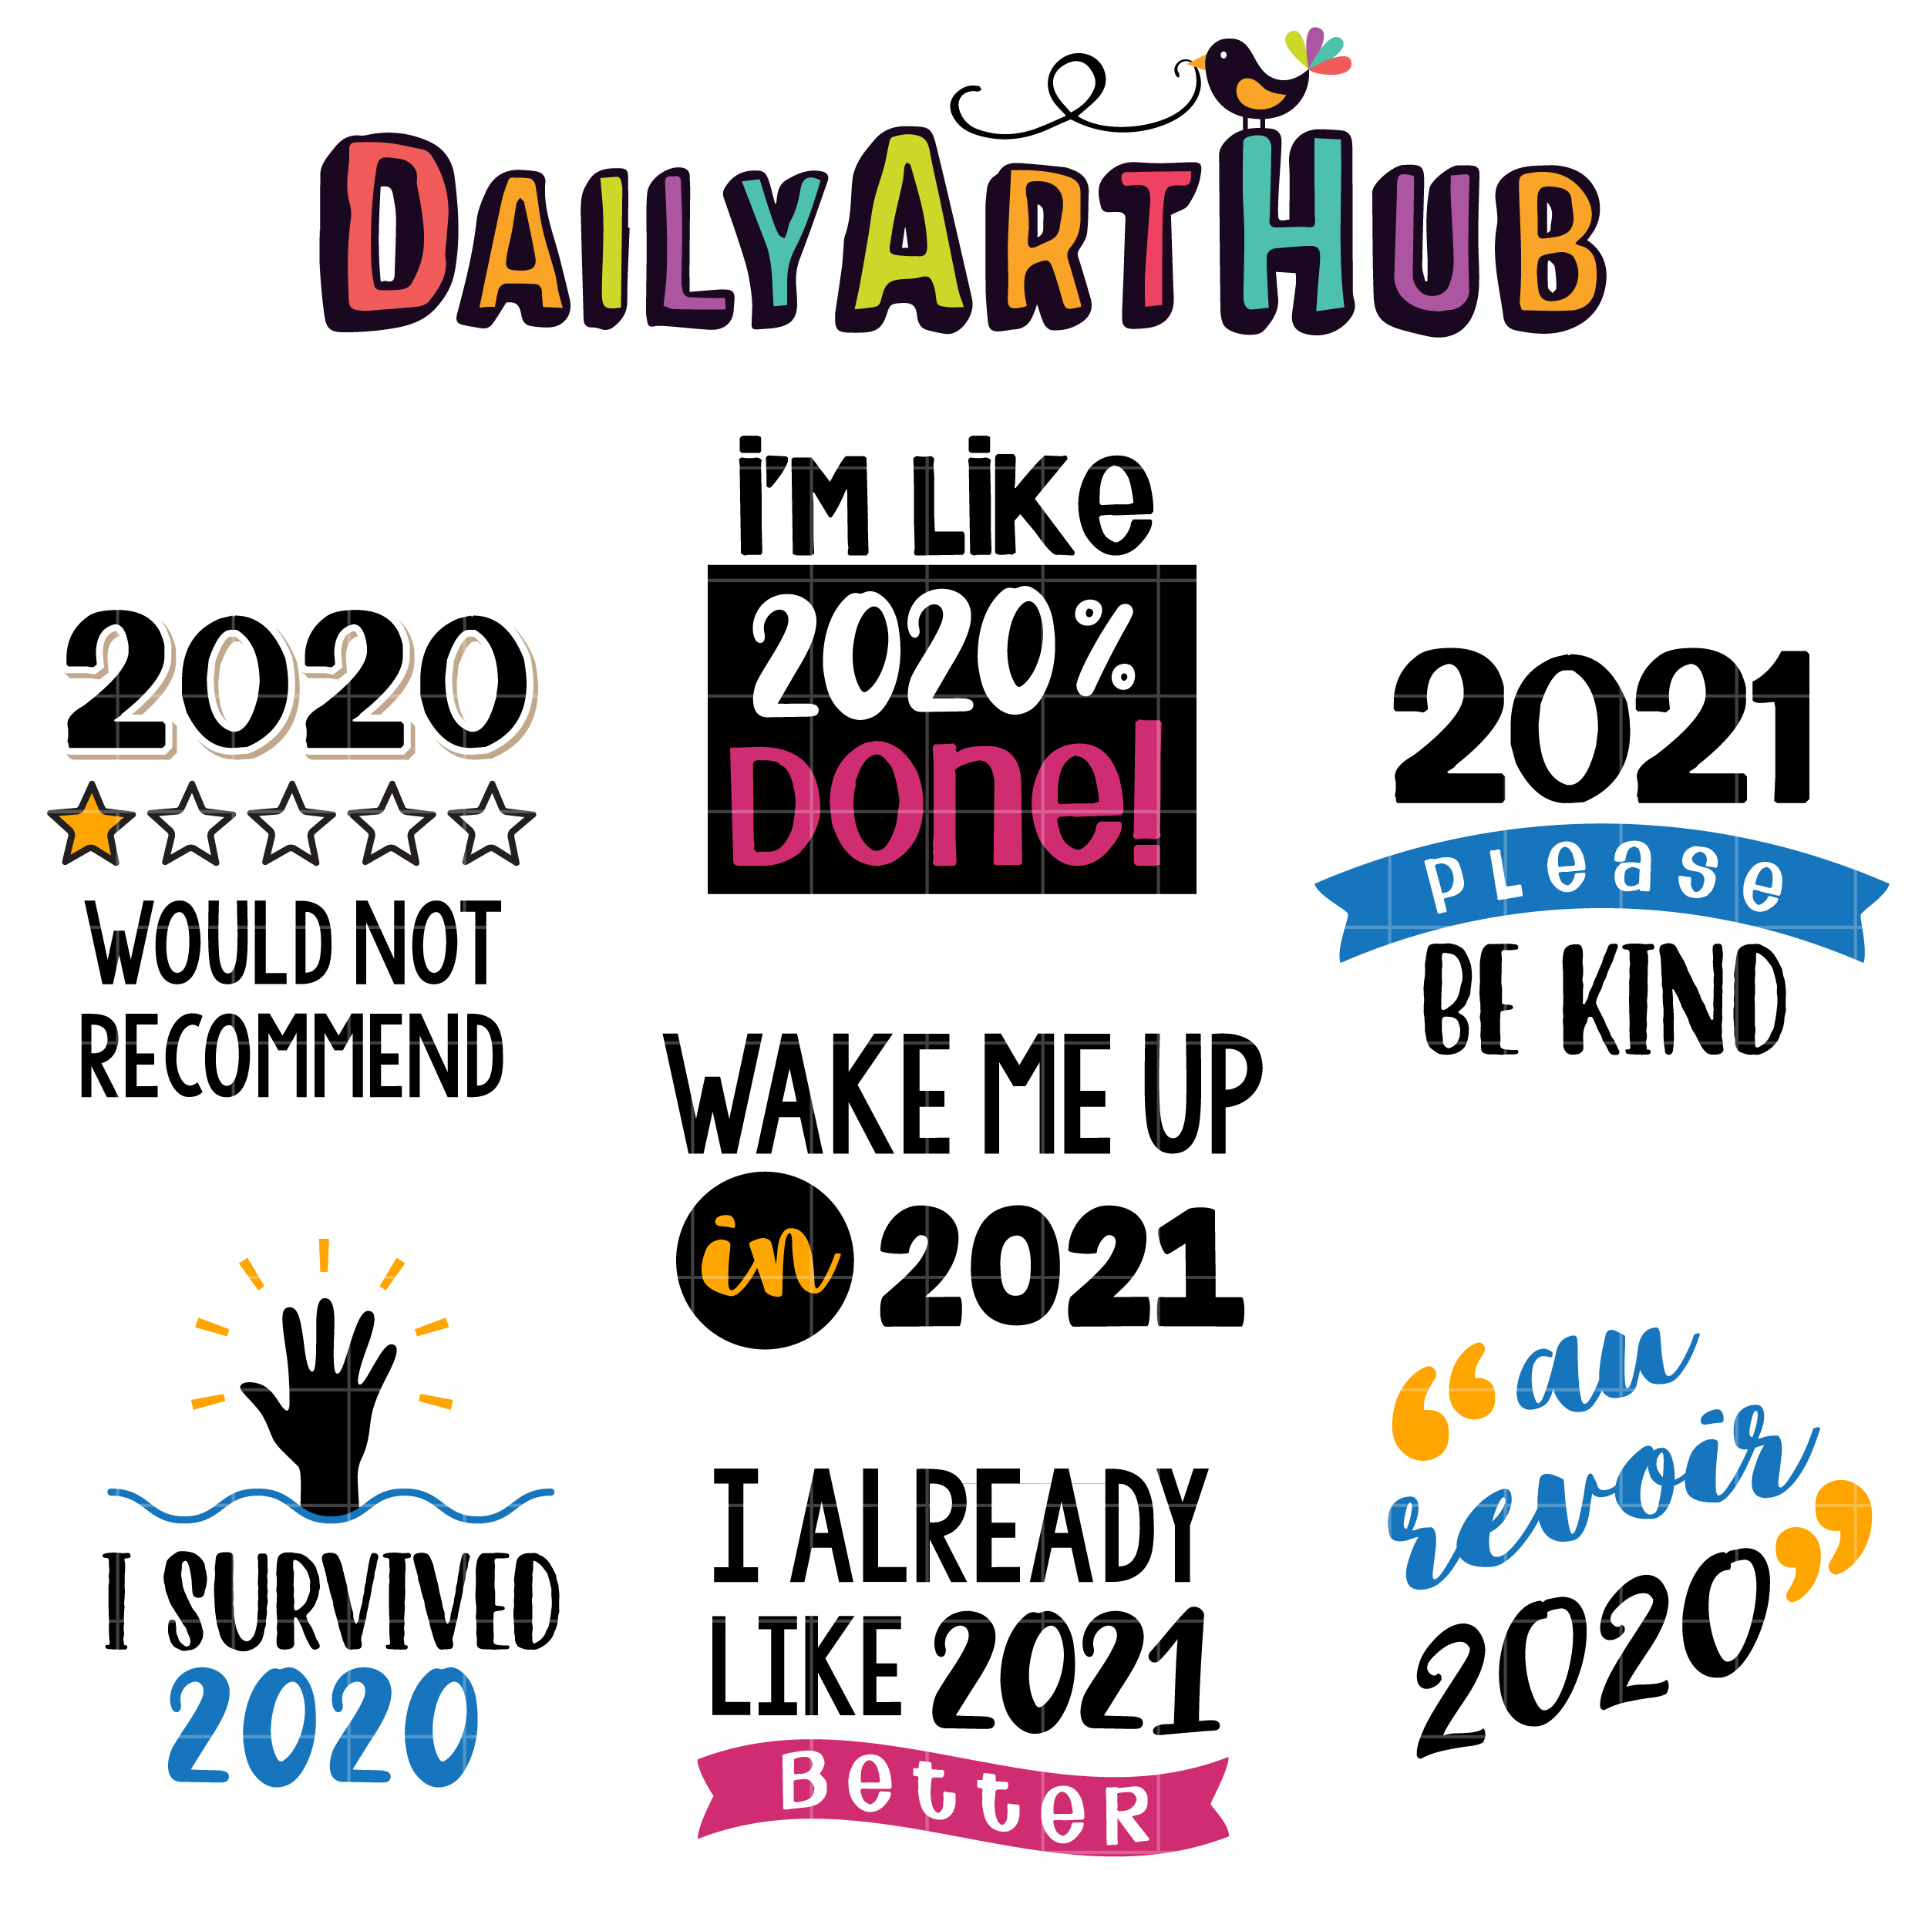 https://www.dailyarthub.com/wp-content/uploads/2020/10/Goodbye-2020-Hello-2021-DAH.jpg